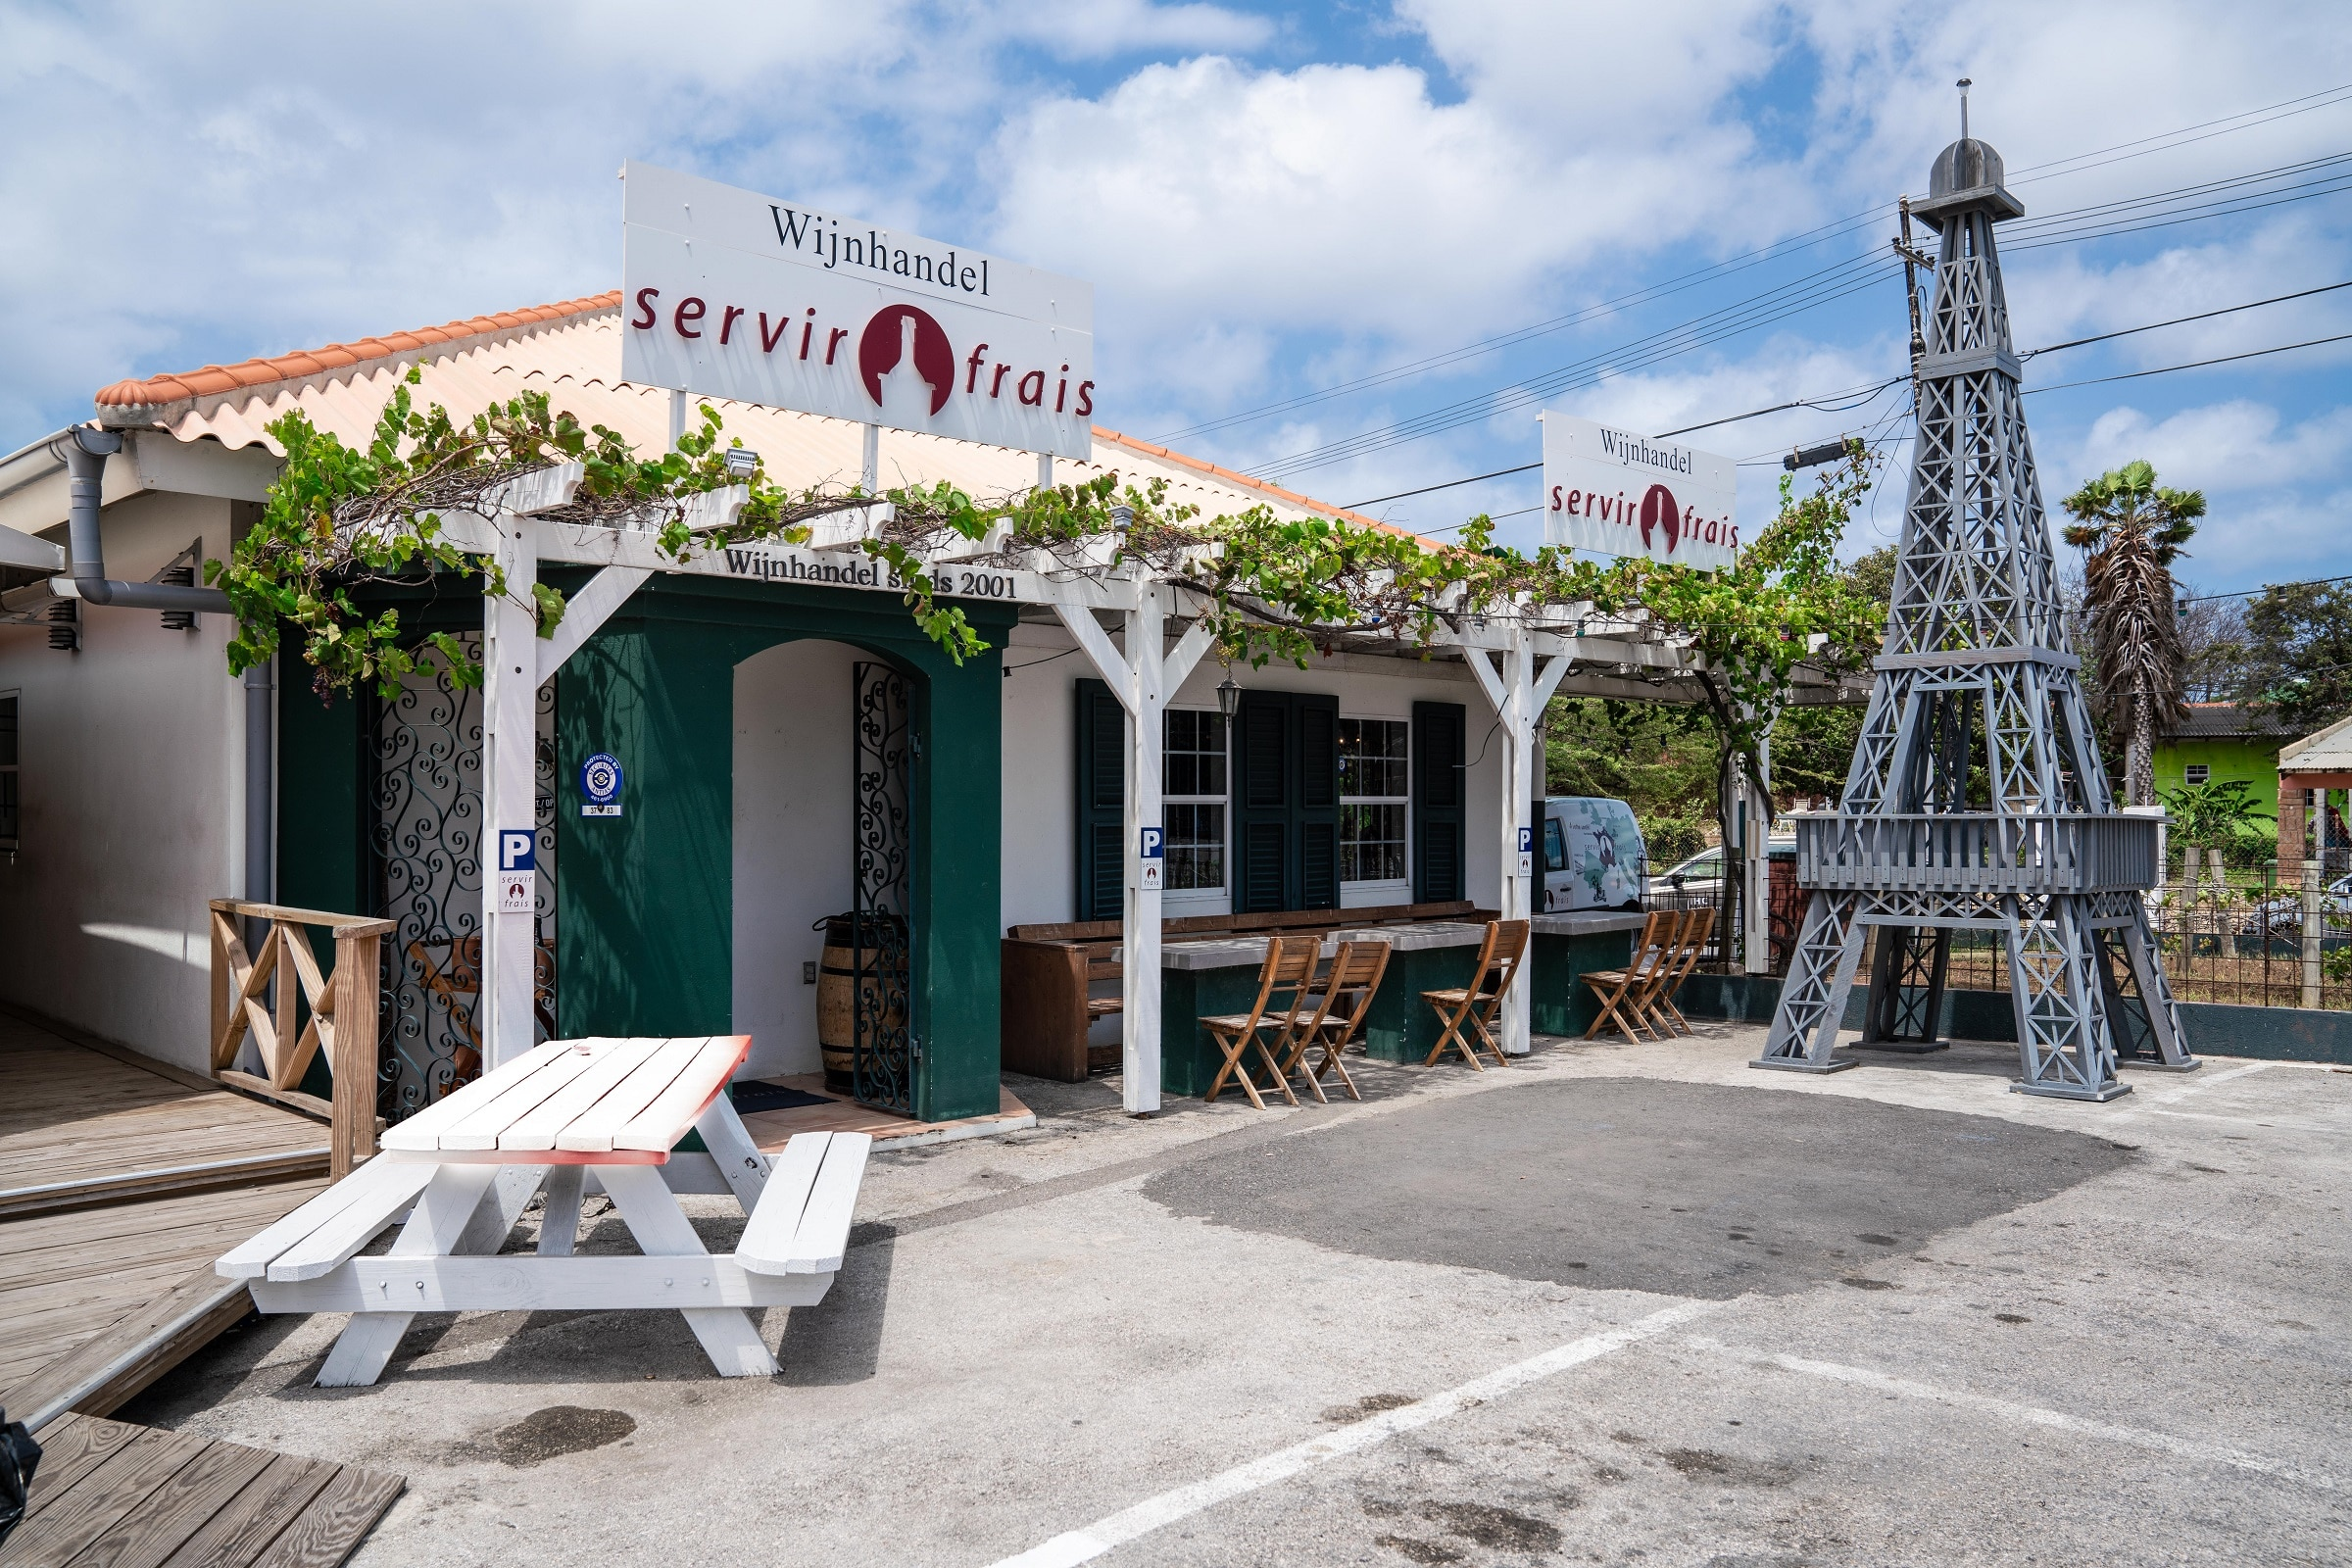 wijnhandel curacao servir frais